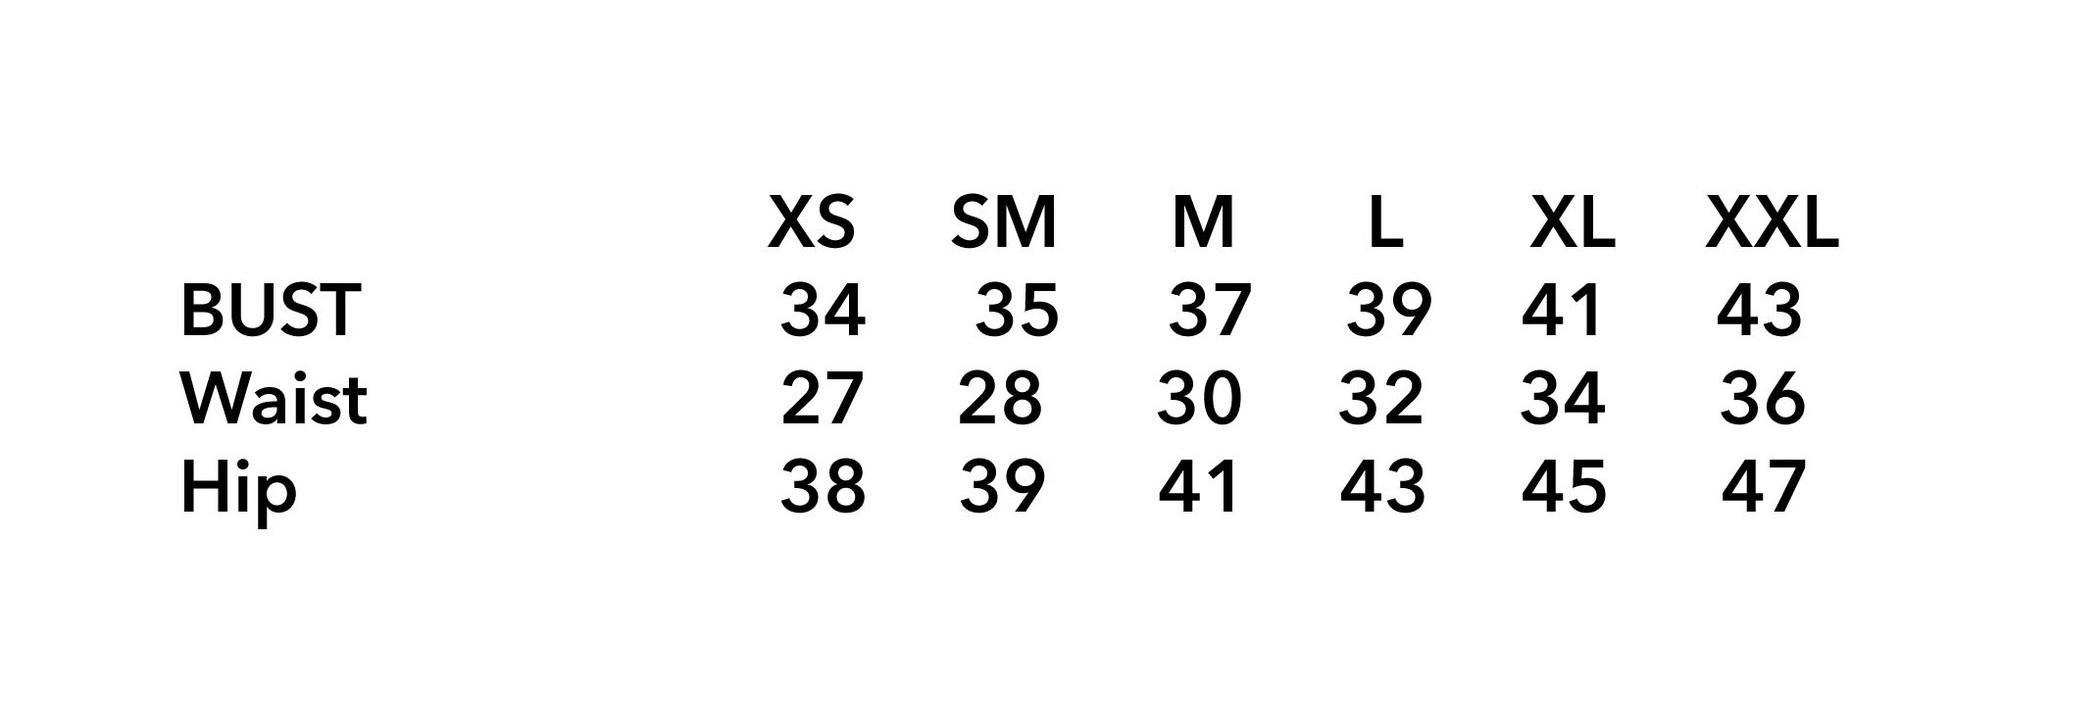 new+size+chart.jpg